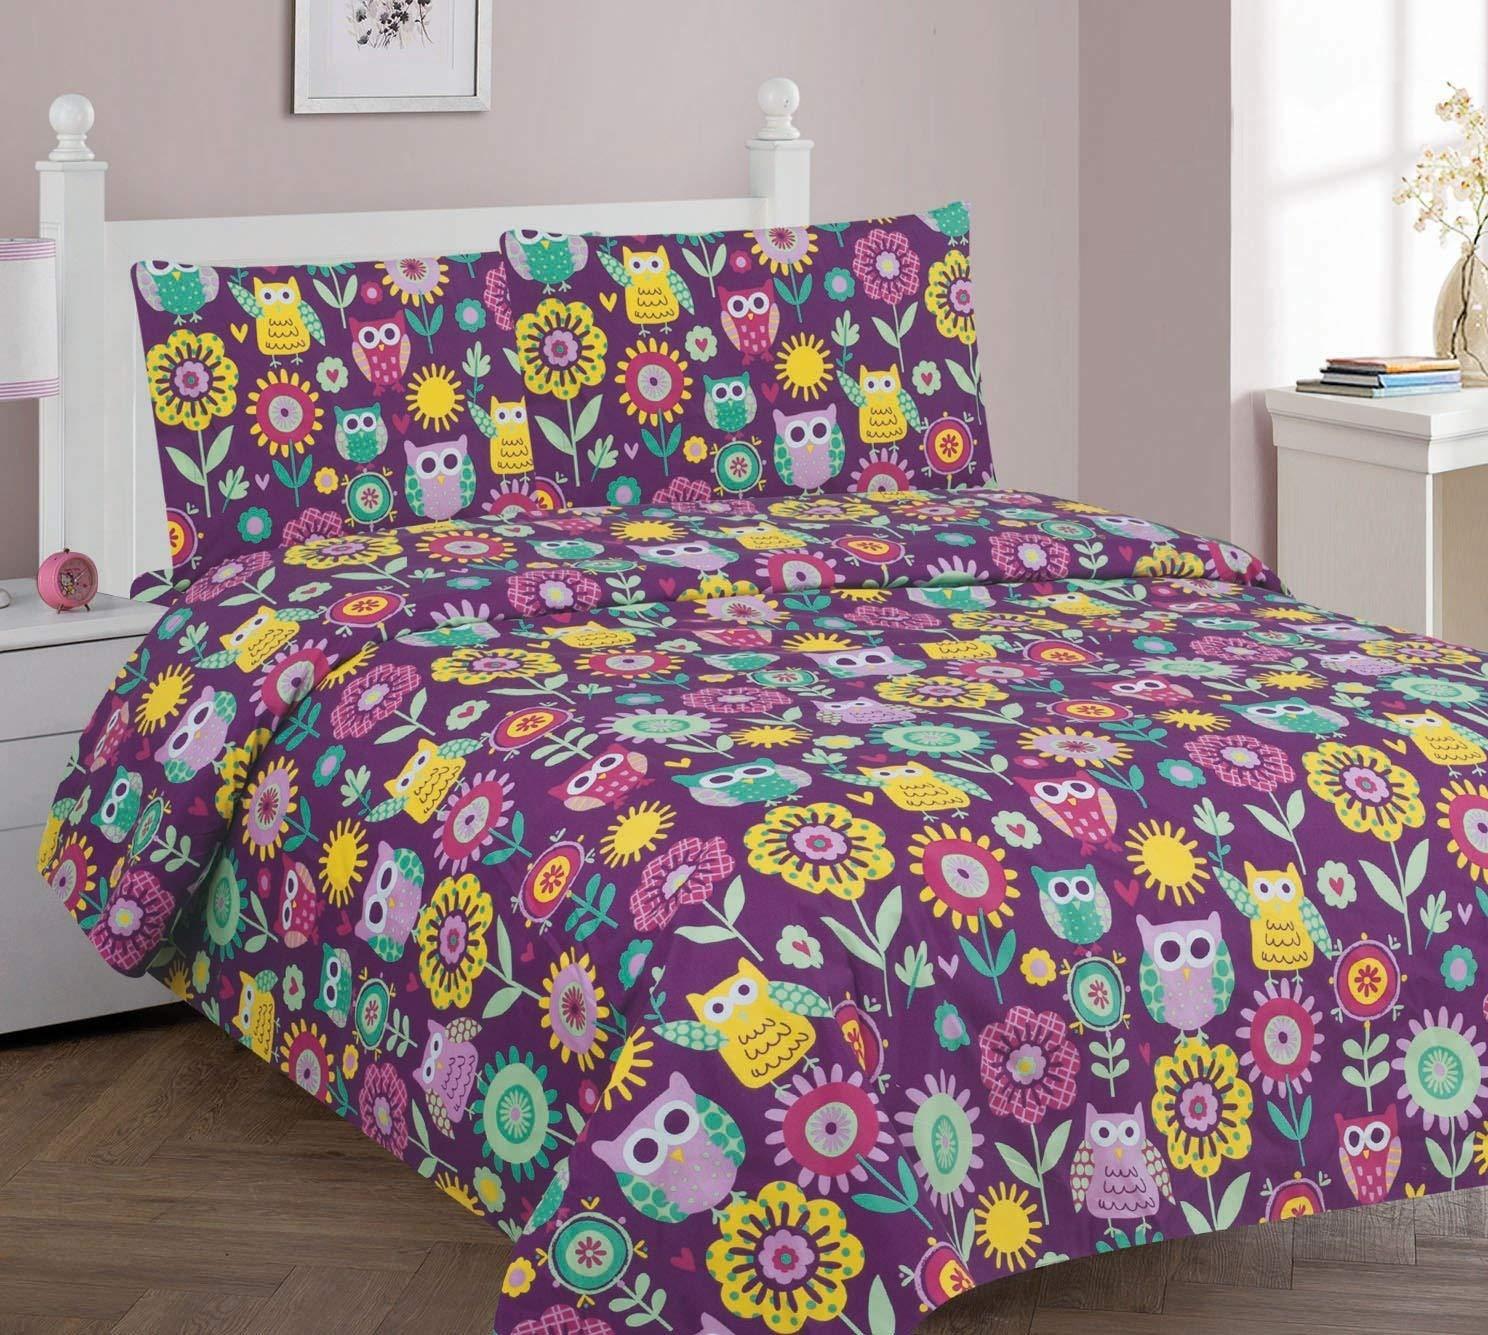 Golden linens Full Size 4 Pieces ( 1pc Flat Sheet, 1 Fitted Sheet & 2 pillow Case) Purple Owl Flower Printed New Designs Kids Bed Sheet Set# Owl Full Sheet